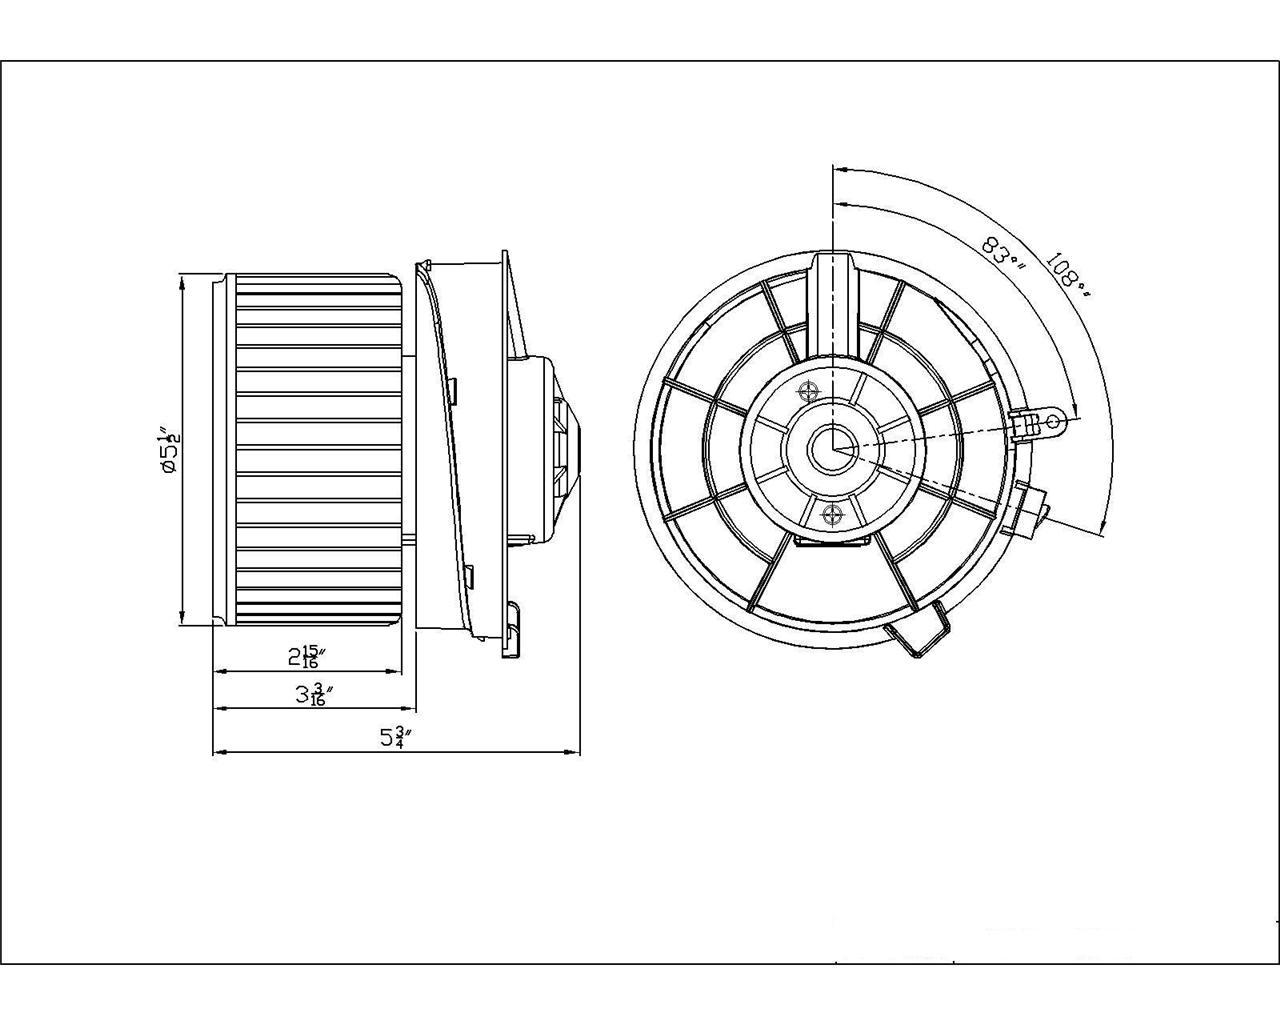 new hvac front blower motor fits 2008 2011 nissan rogue. Black Bedroom Furniture Sets. Home Design Ideas